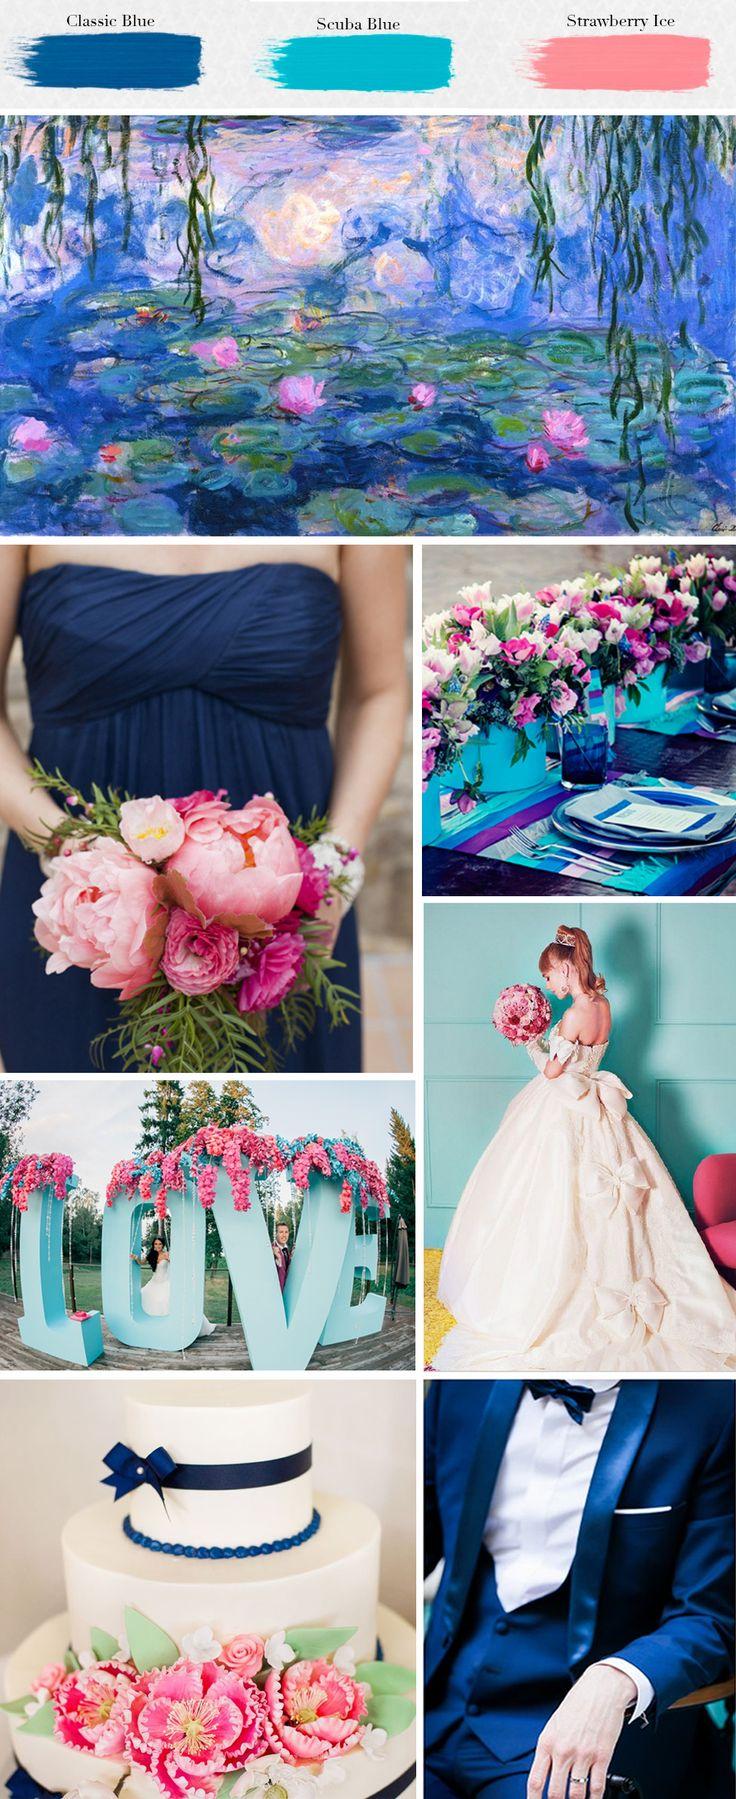 Best 25+ Spring wedding colors ideas on Pinterest | Spring ...